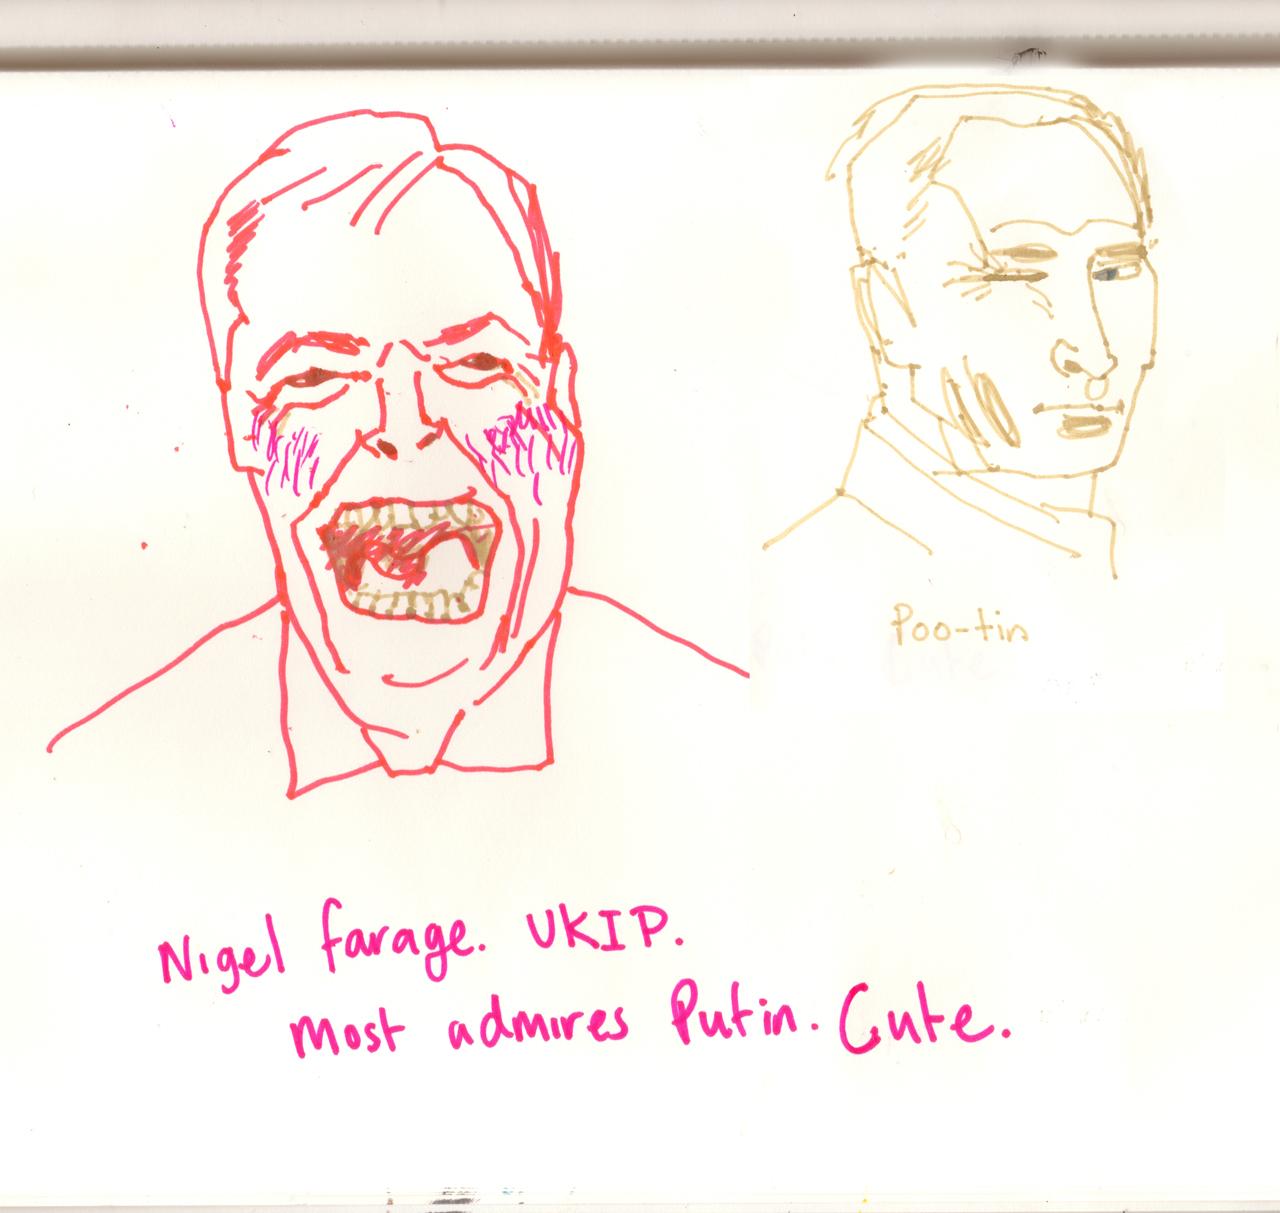 Nigel Farage and Putinsml